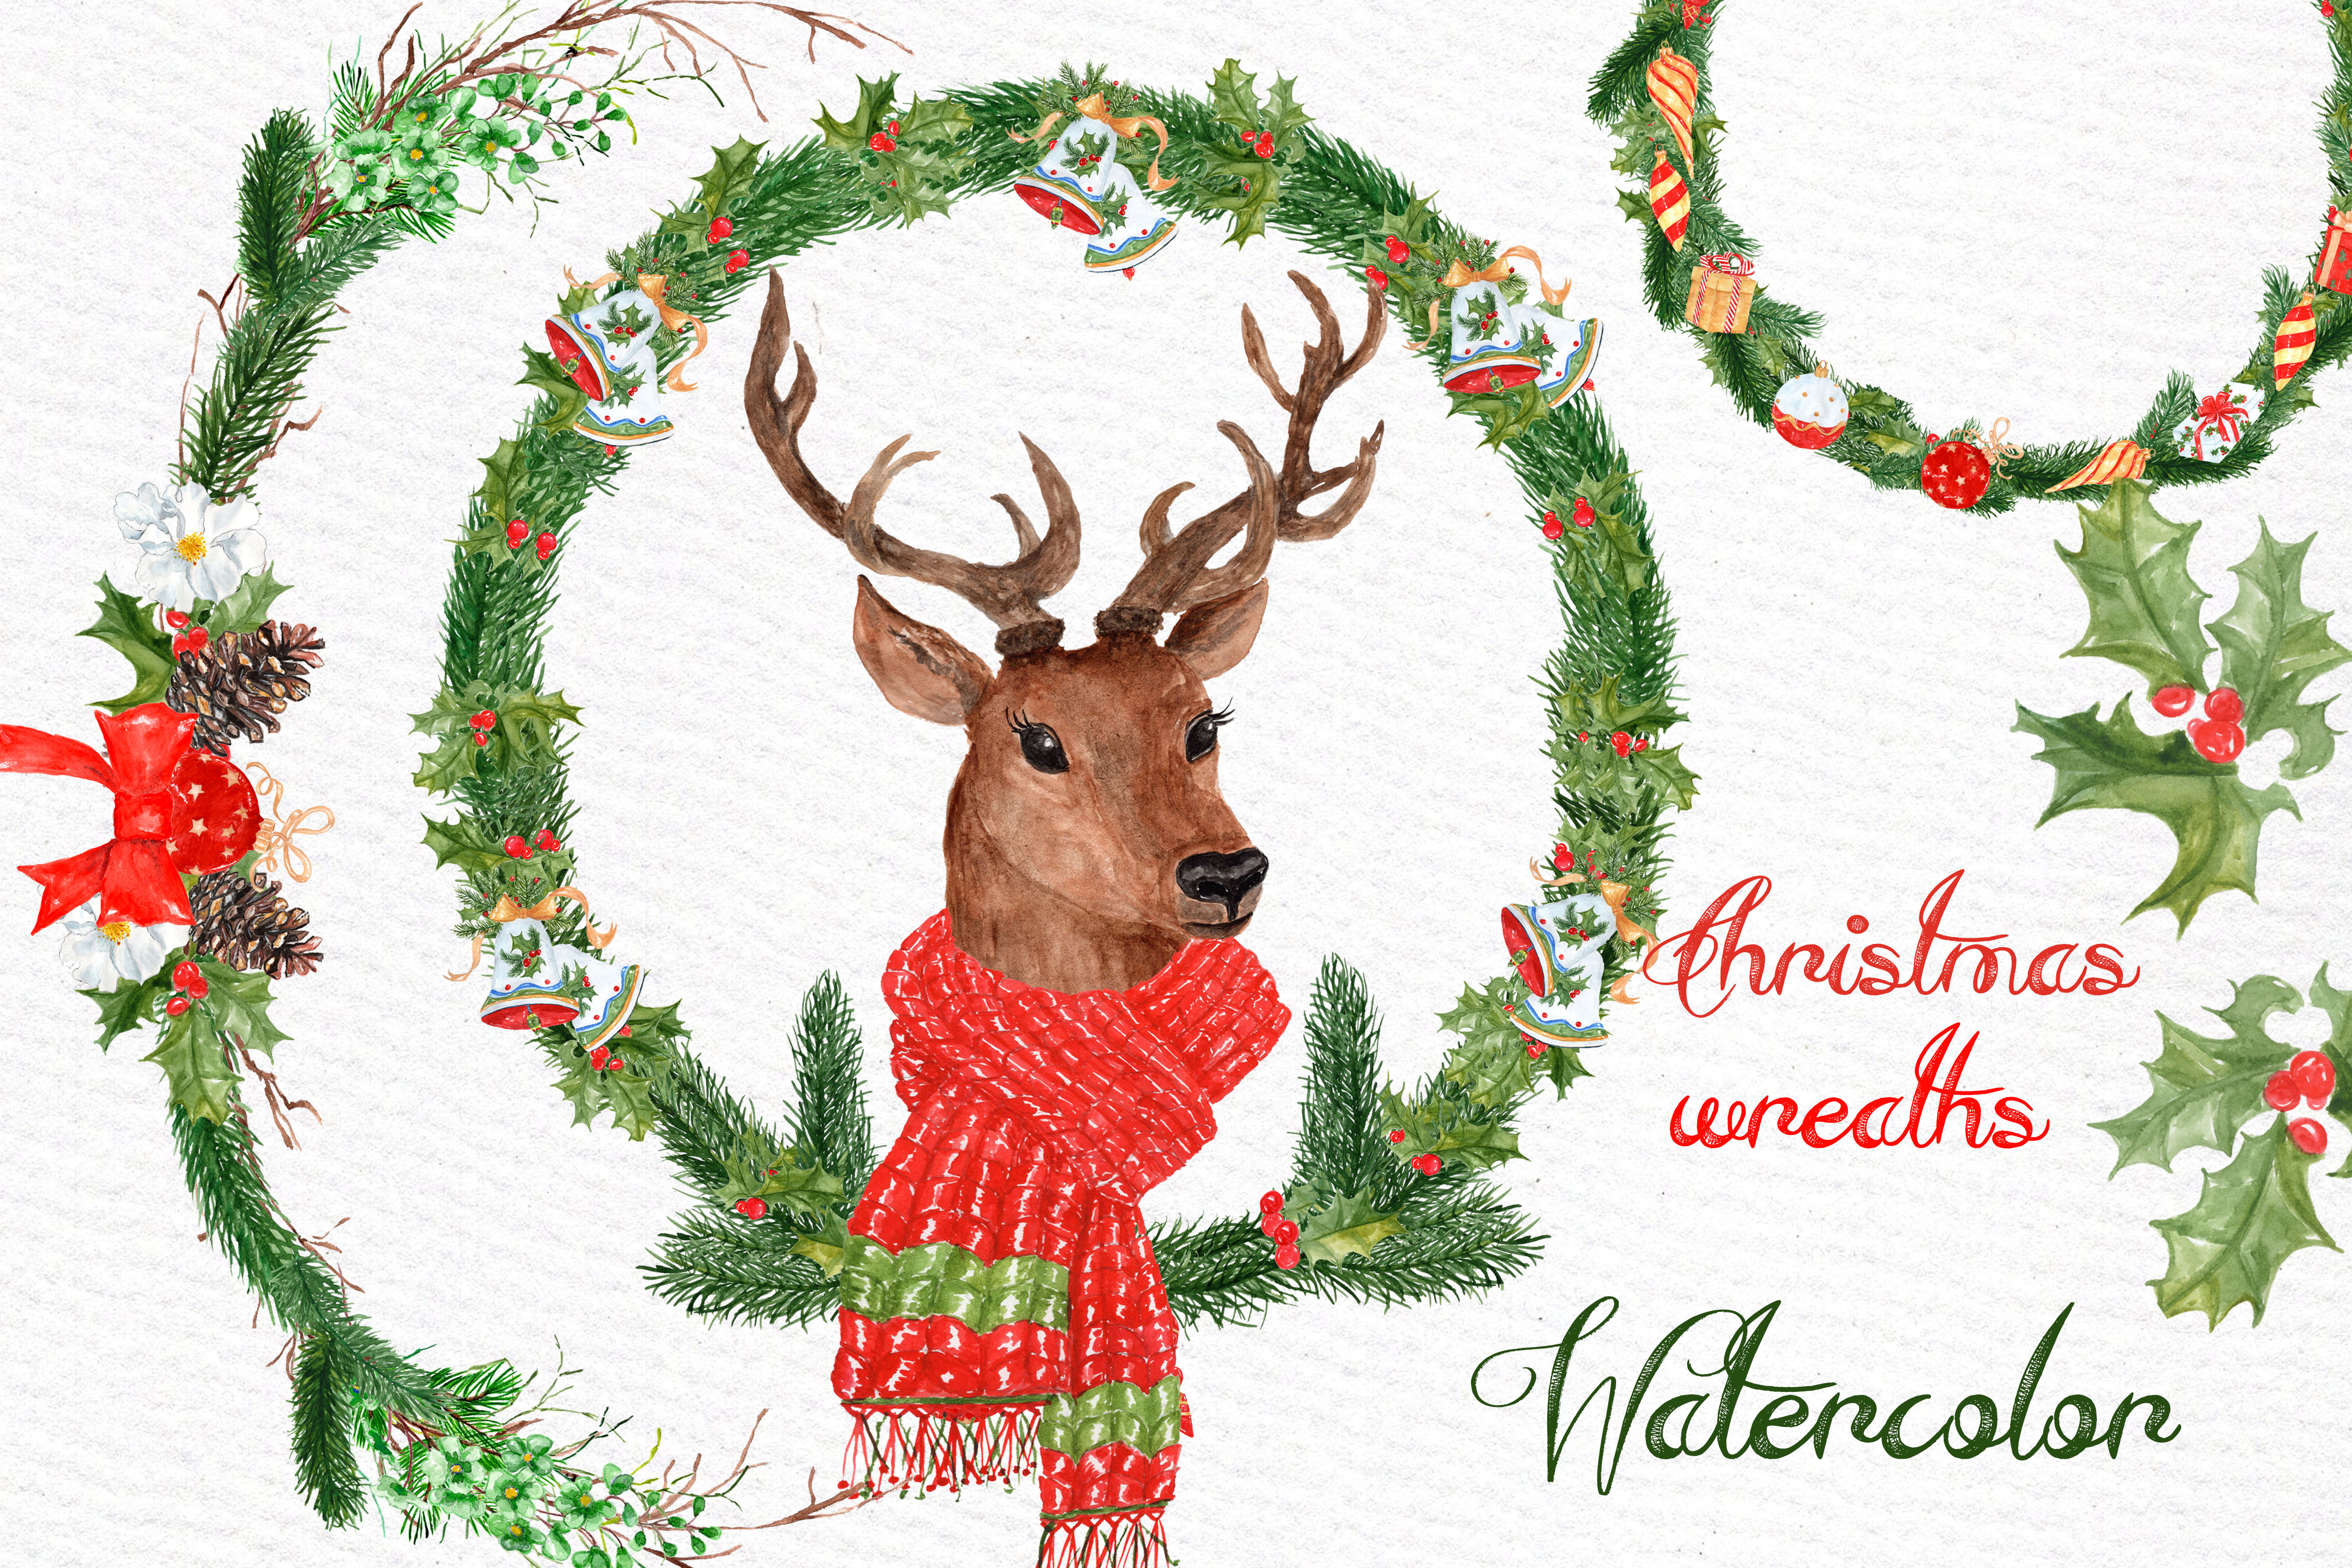 Watercolor Christmas Deer clipart.